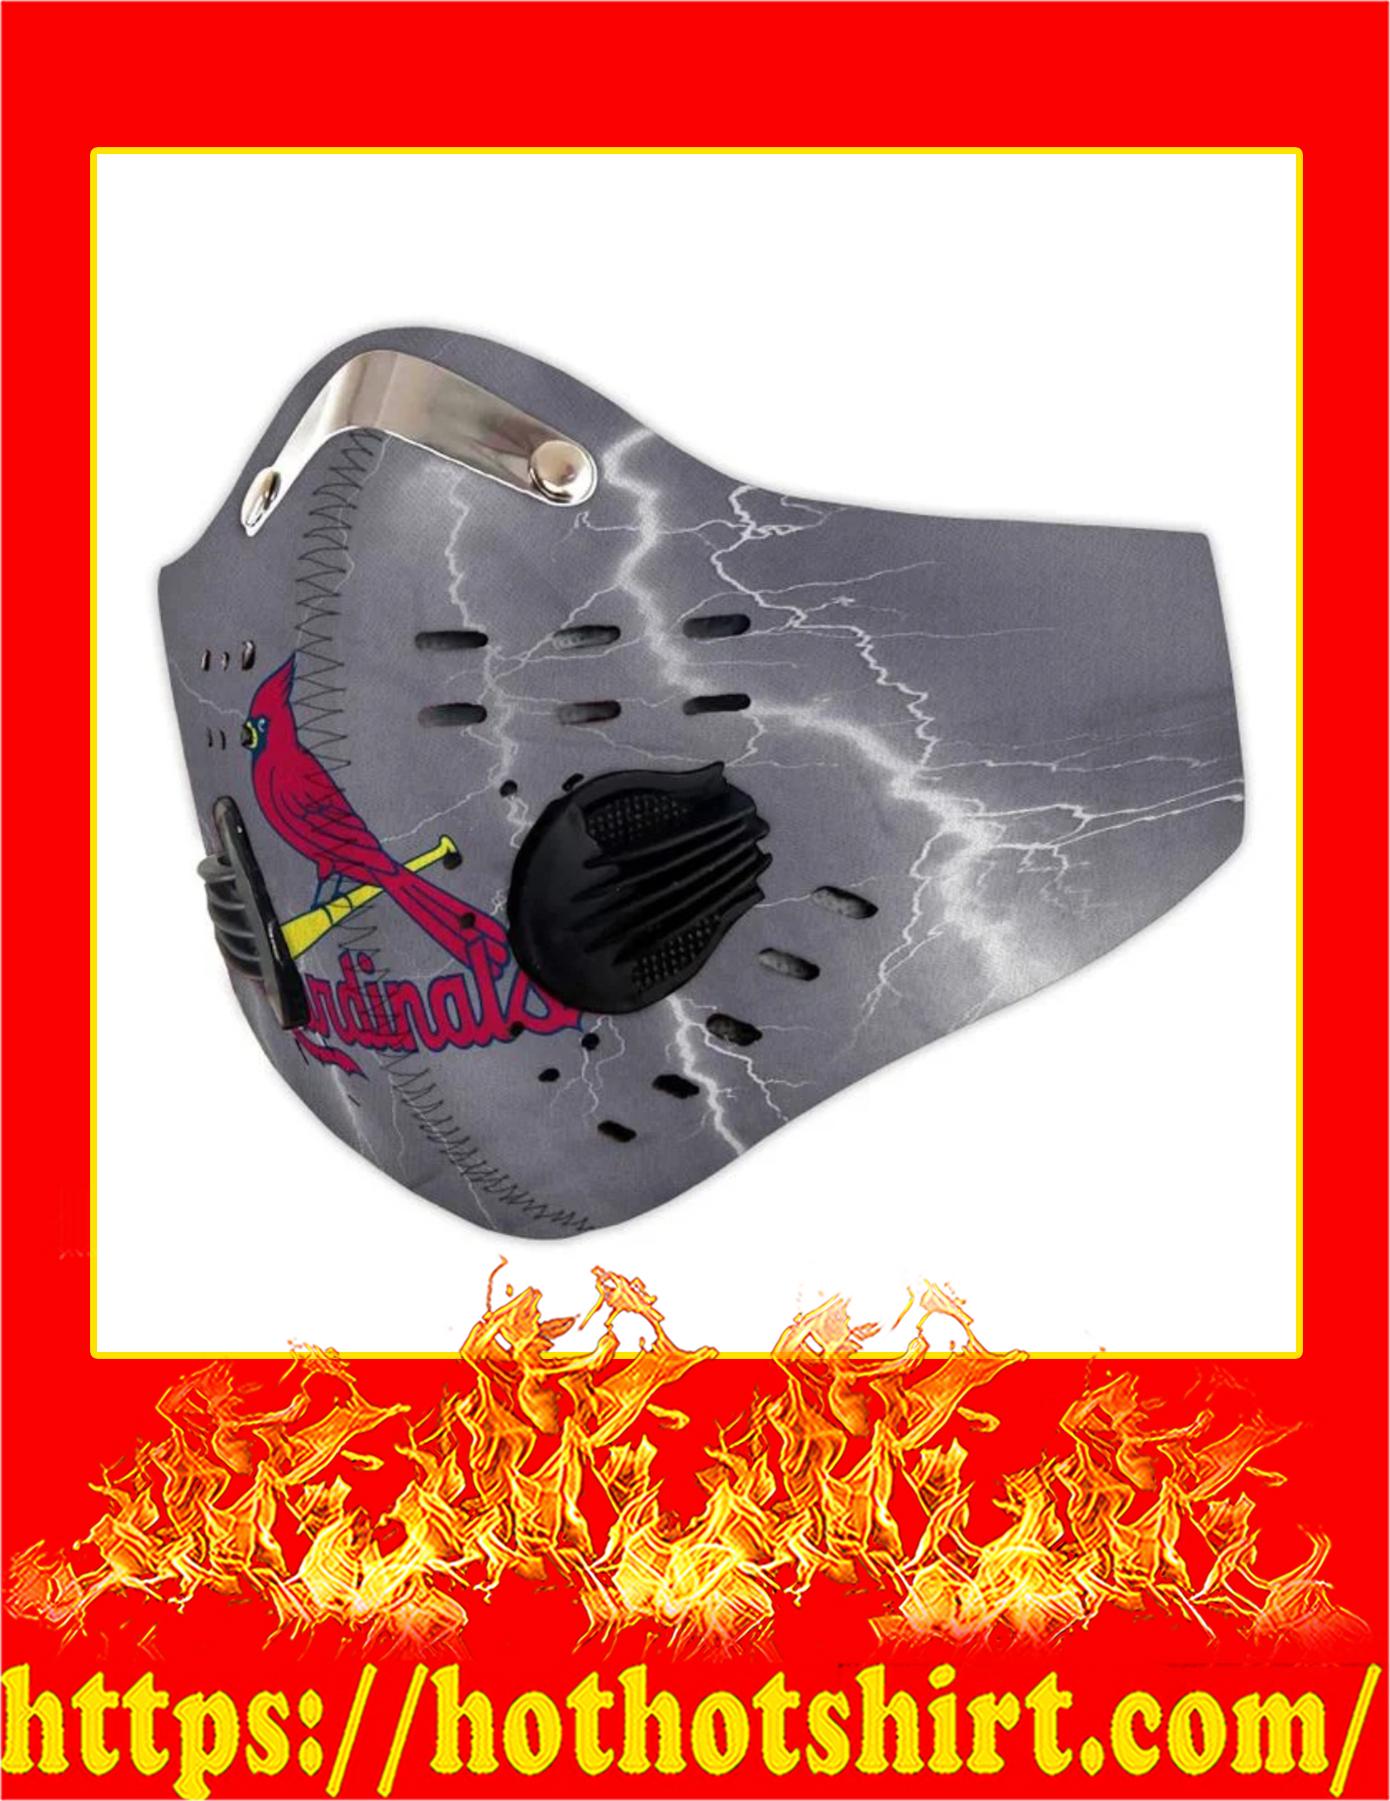 St louis cardinals filter face mask - Pic 1